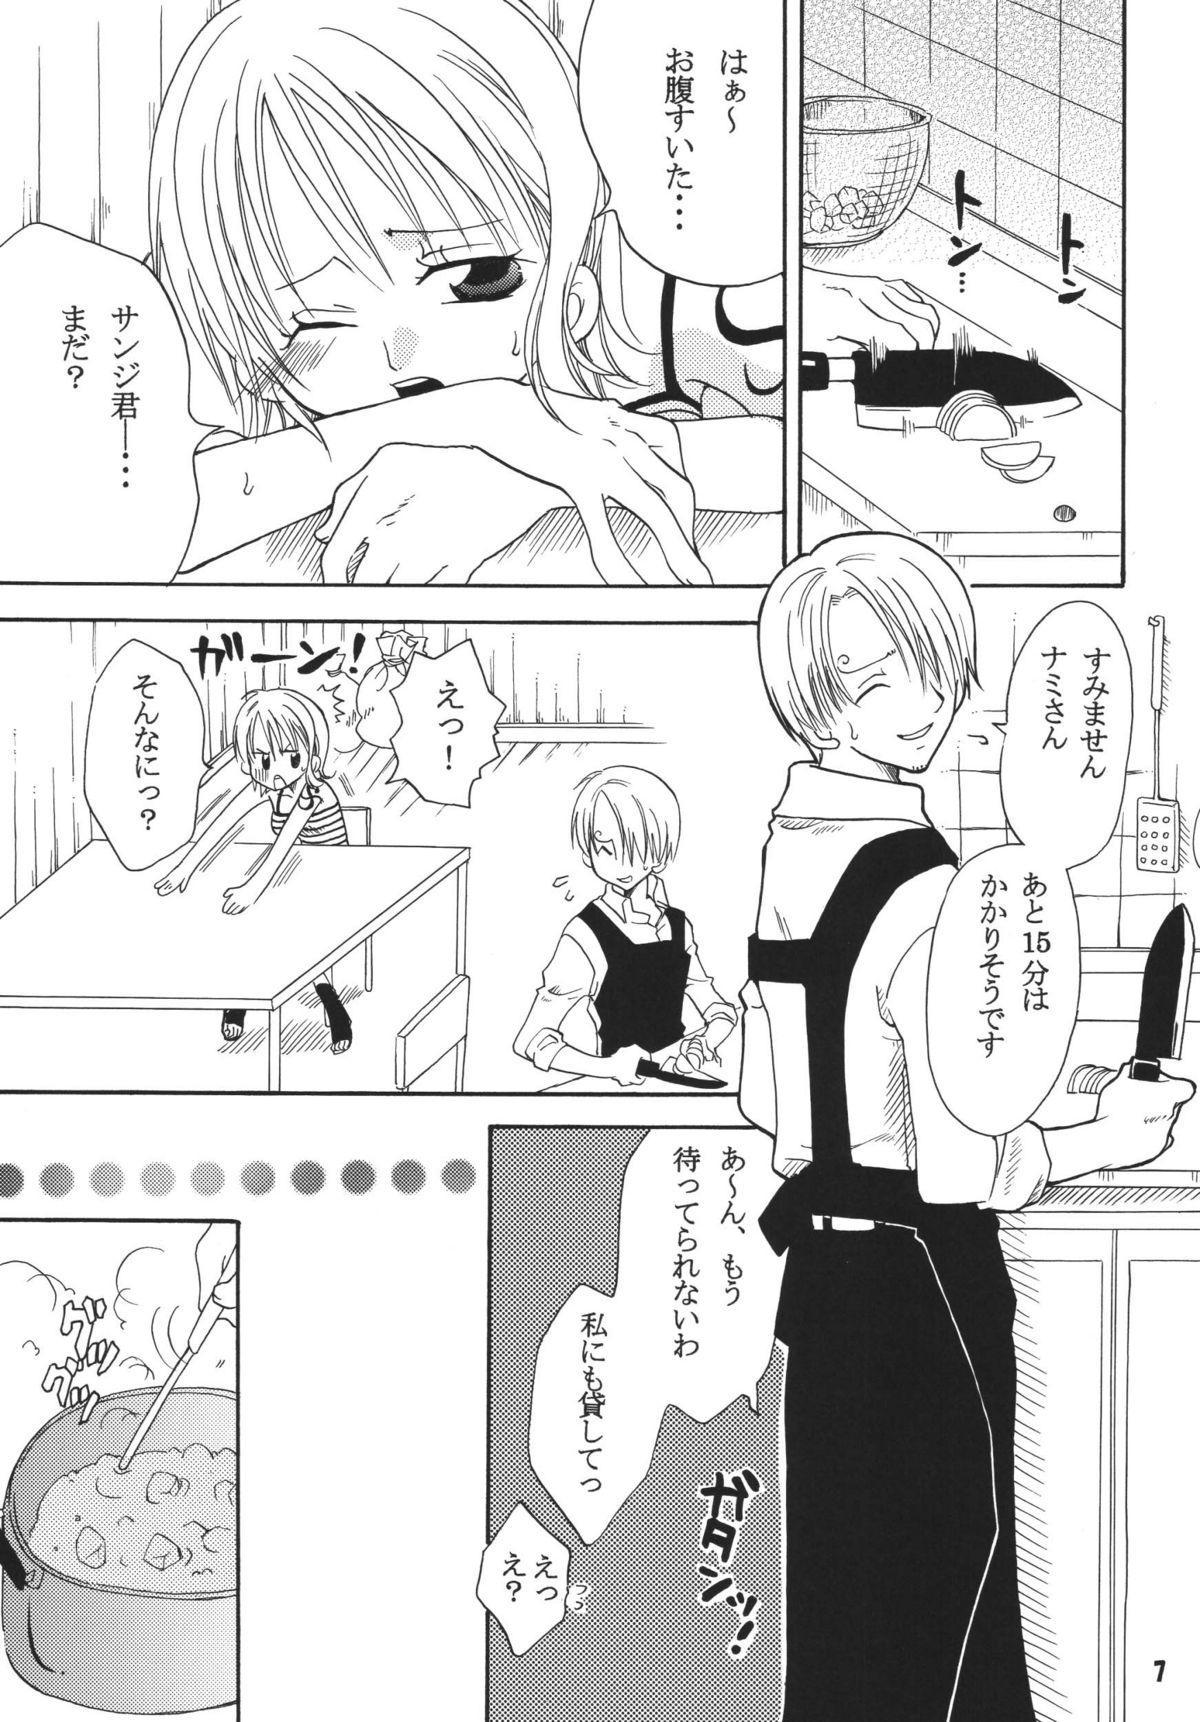 Kaizoku Musume. DX 5